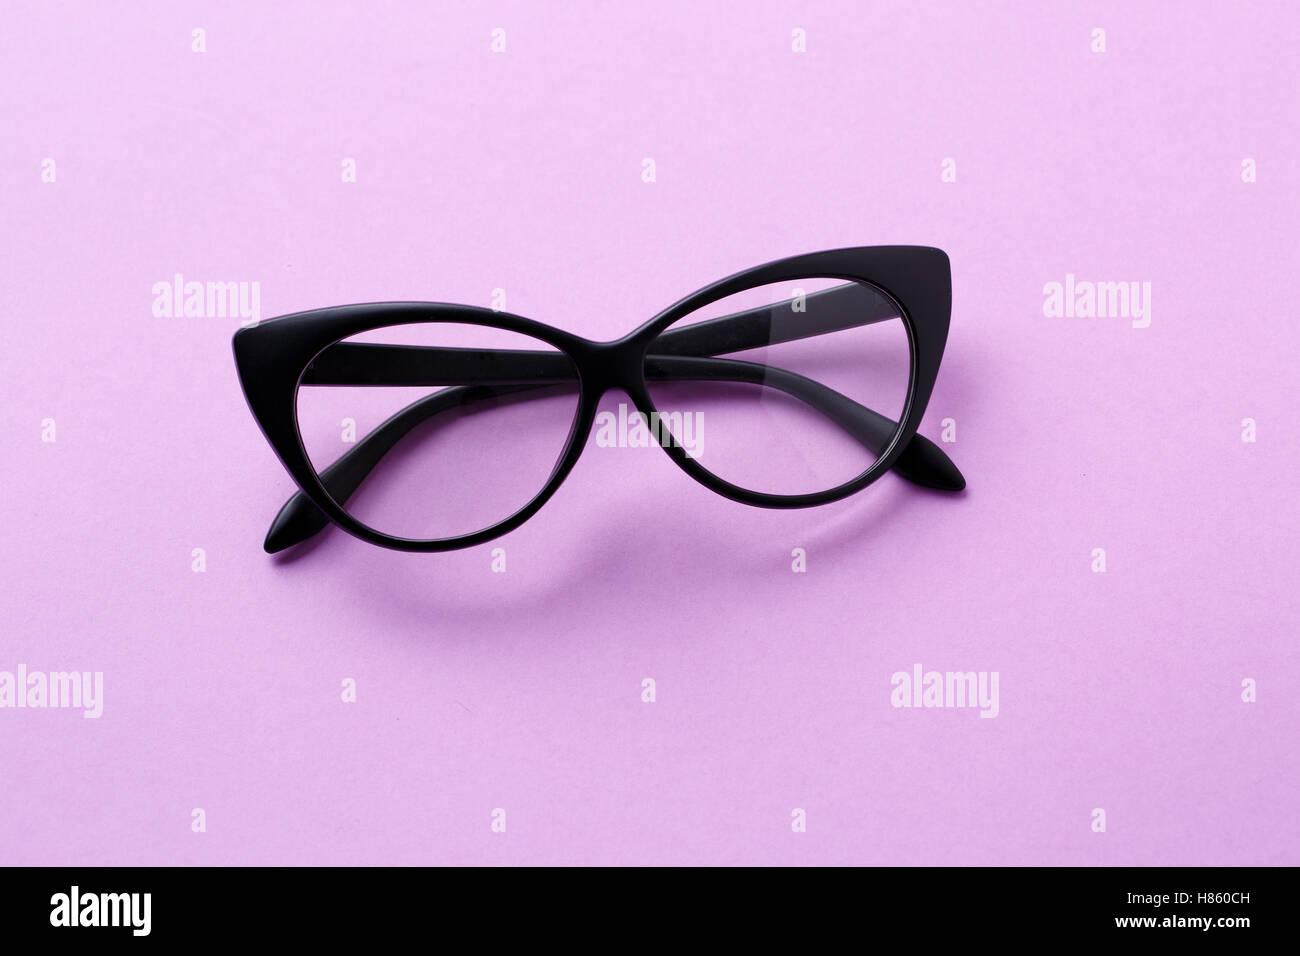 Purple Glasses Eyeglasses Spectacles Stockfotos & Purple Glasses ...